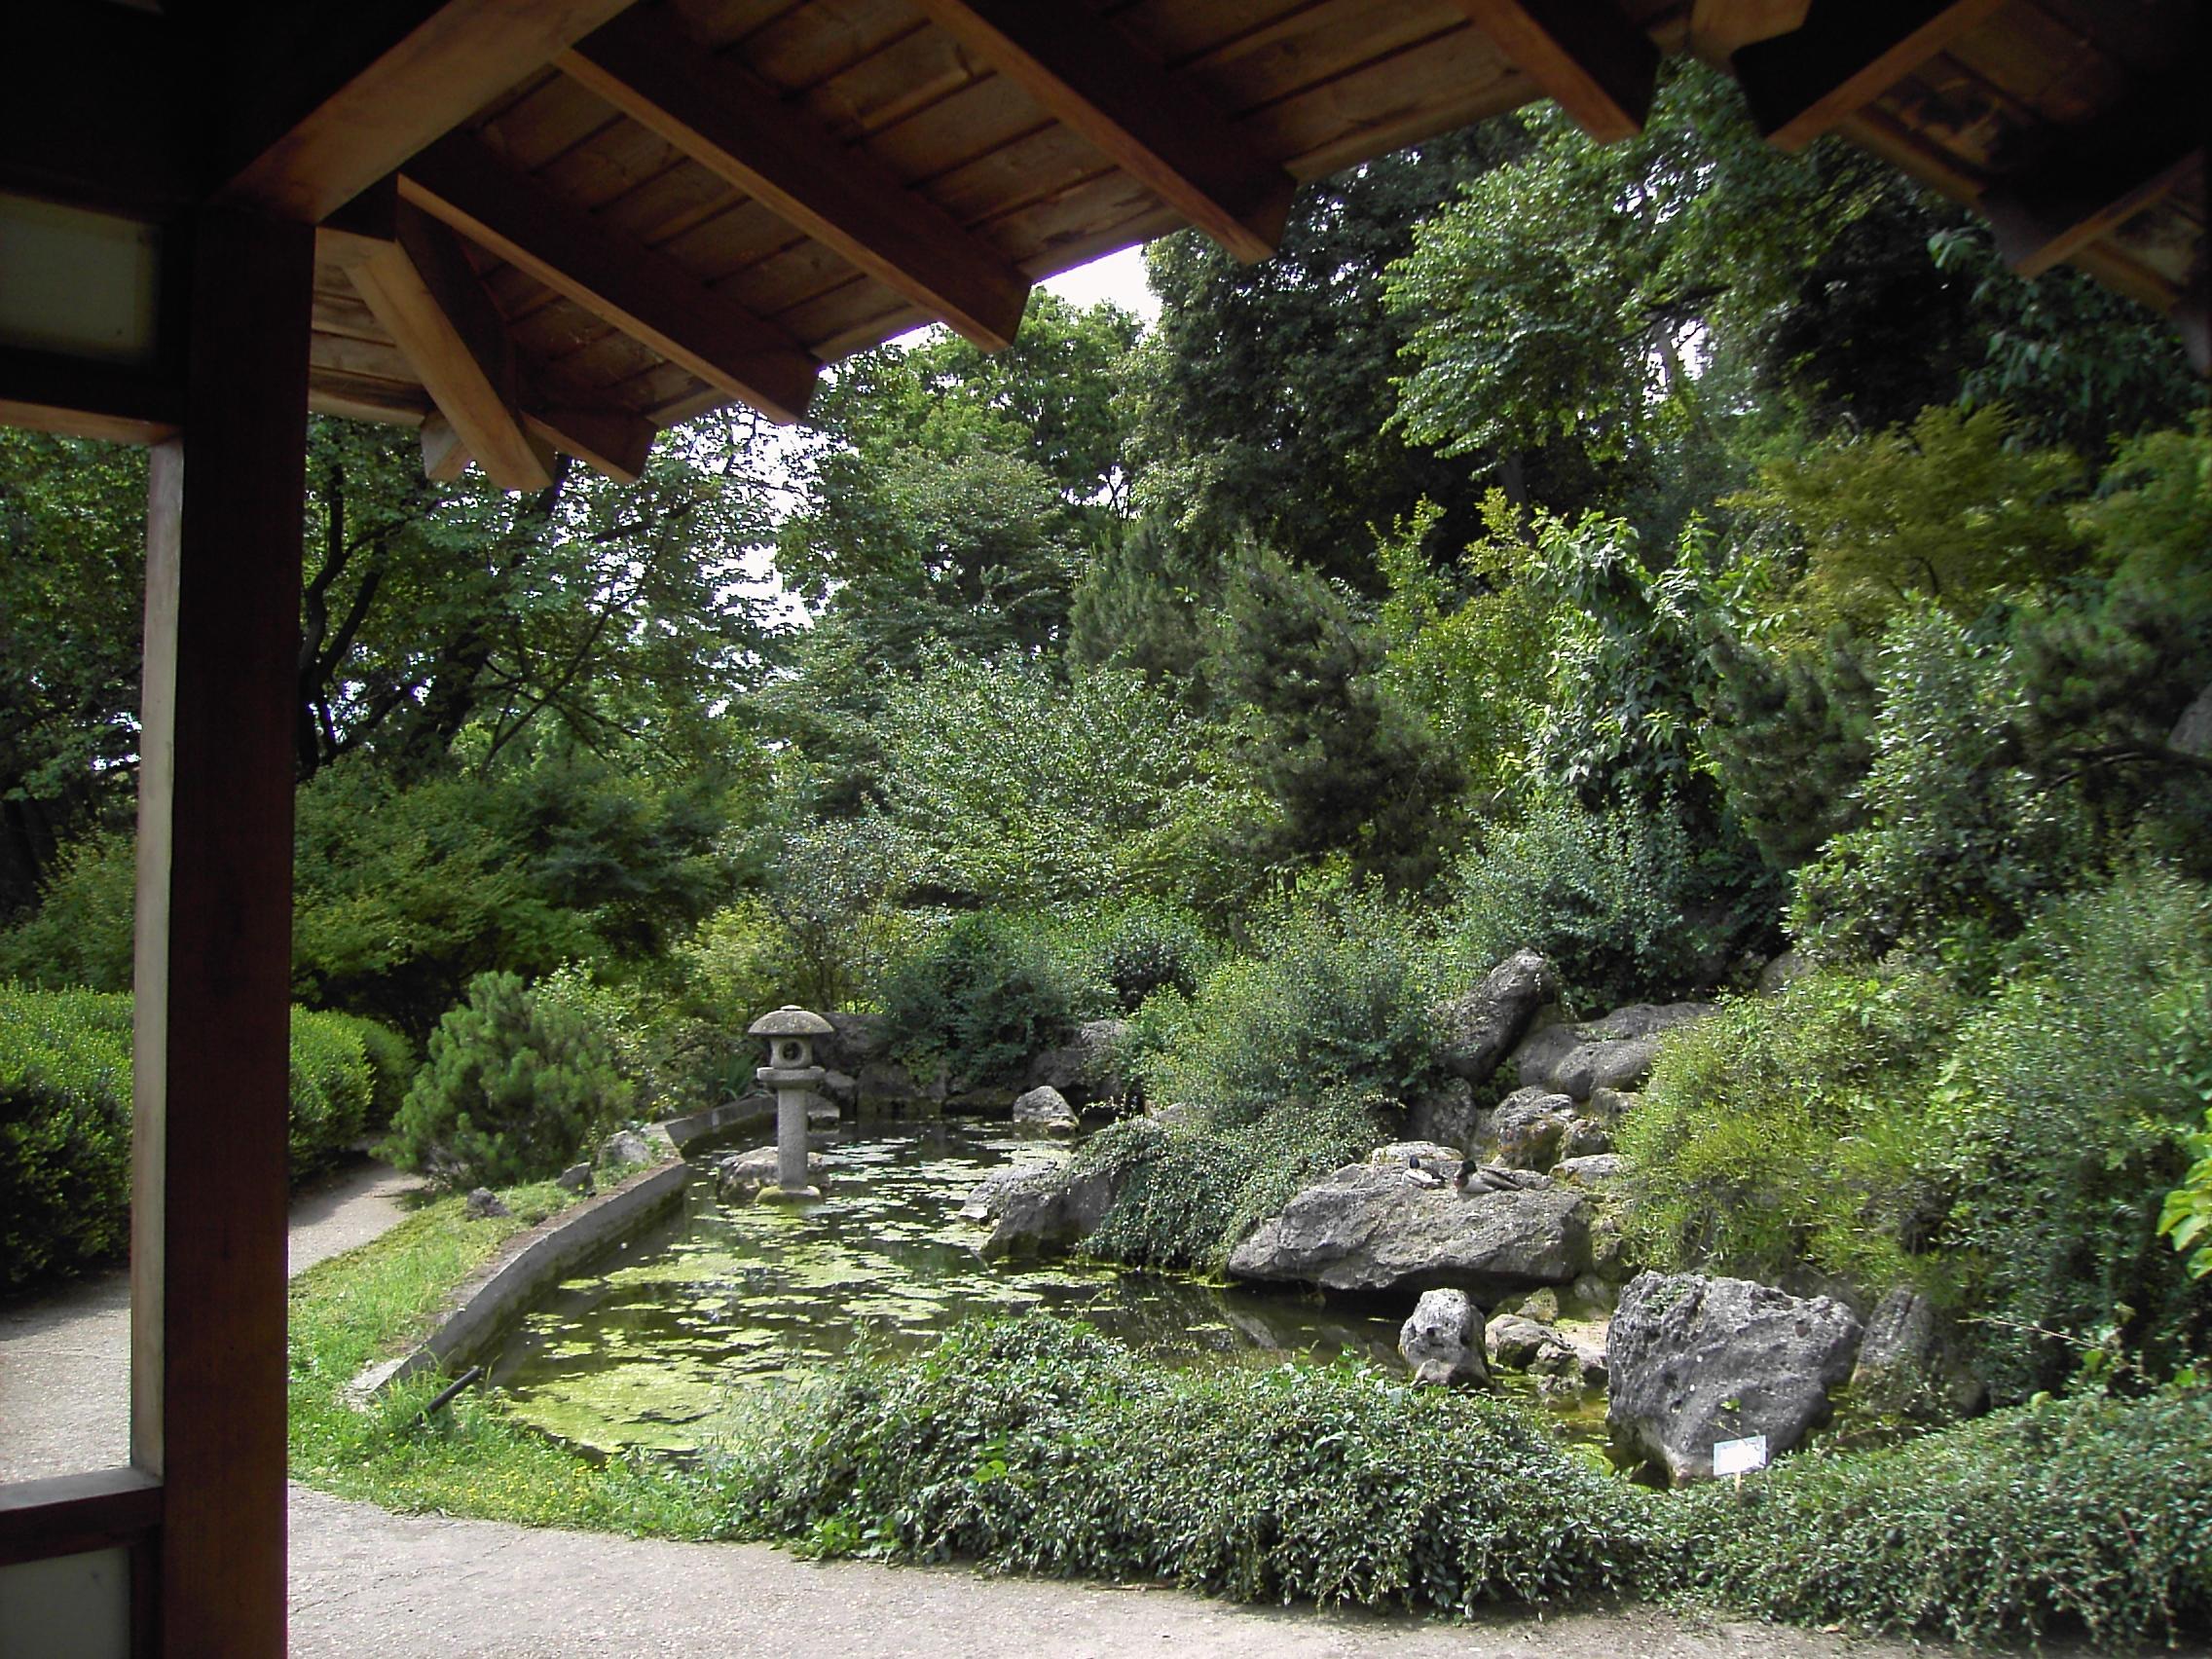 Fileorto Botanico  Il Giardino Giapponese 2747jpg